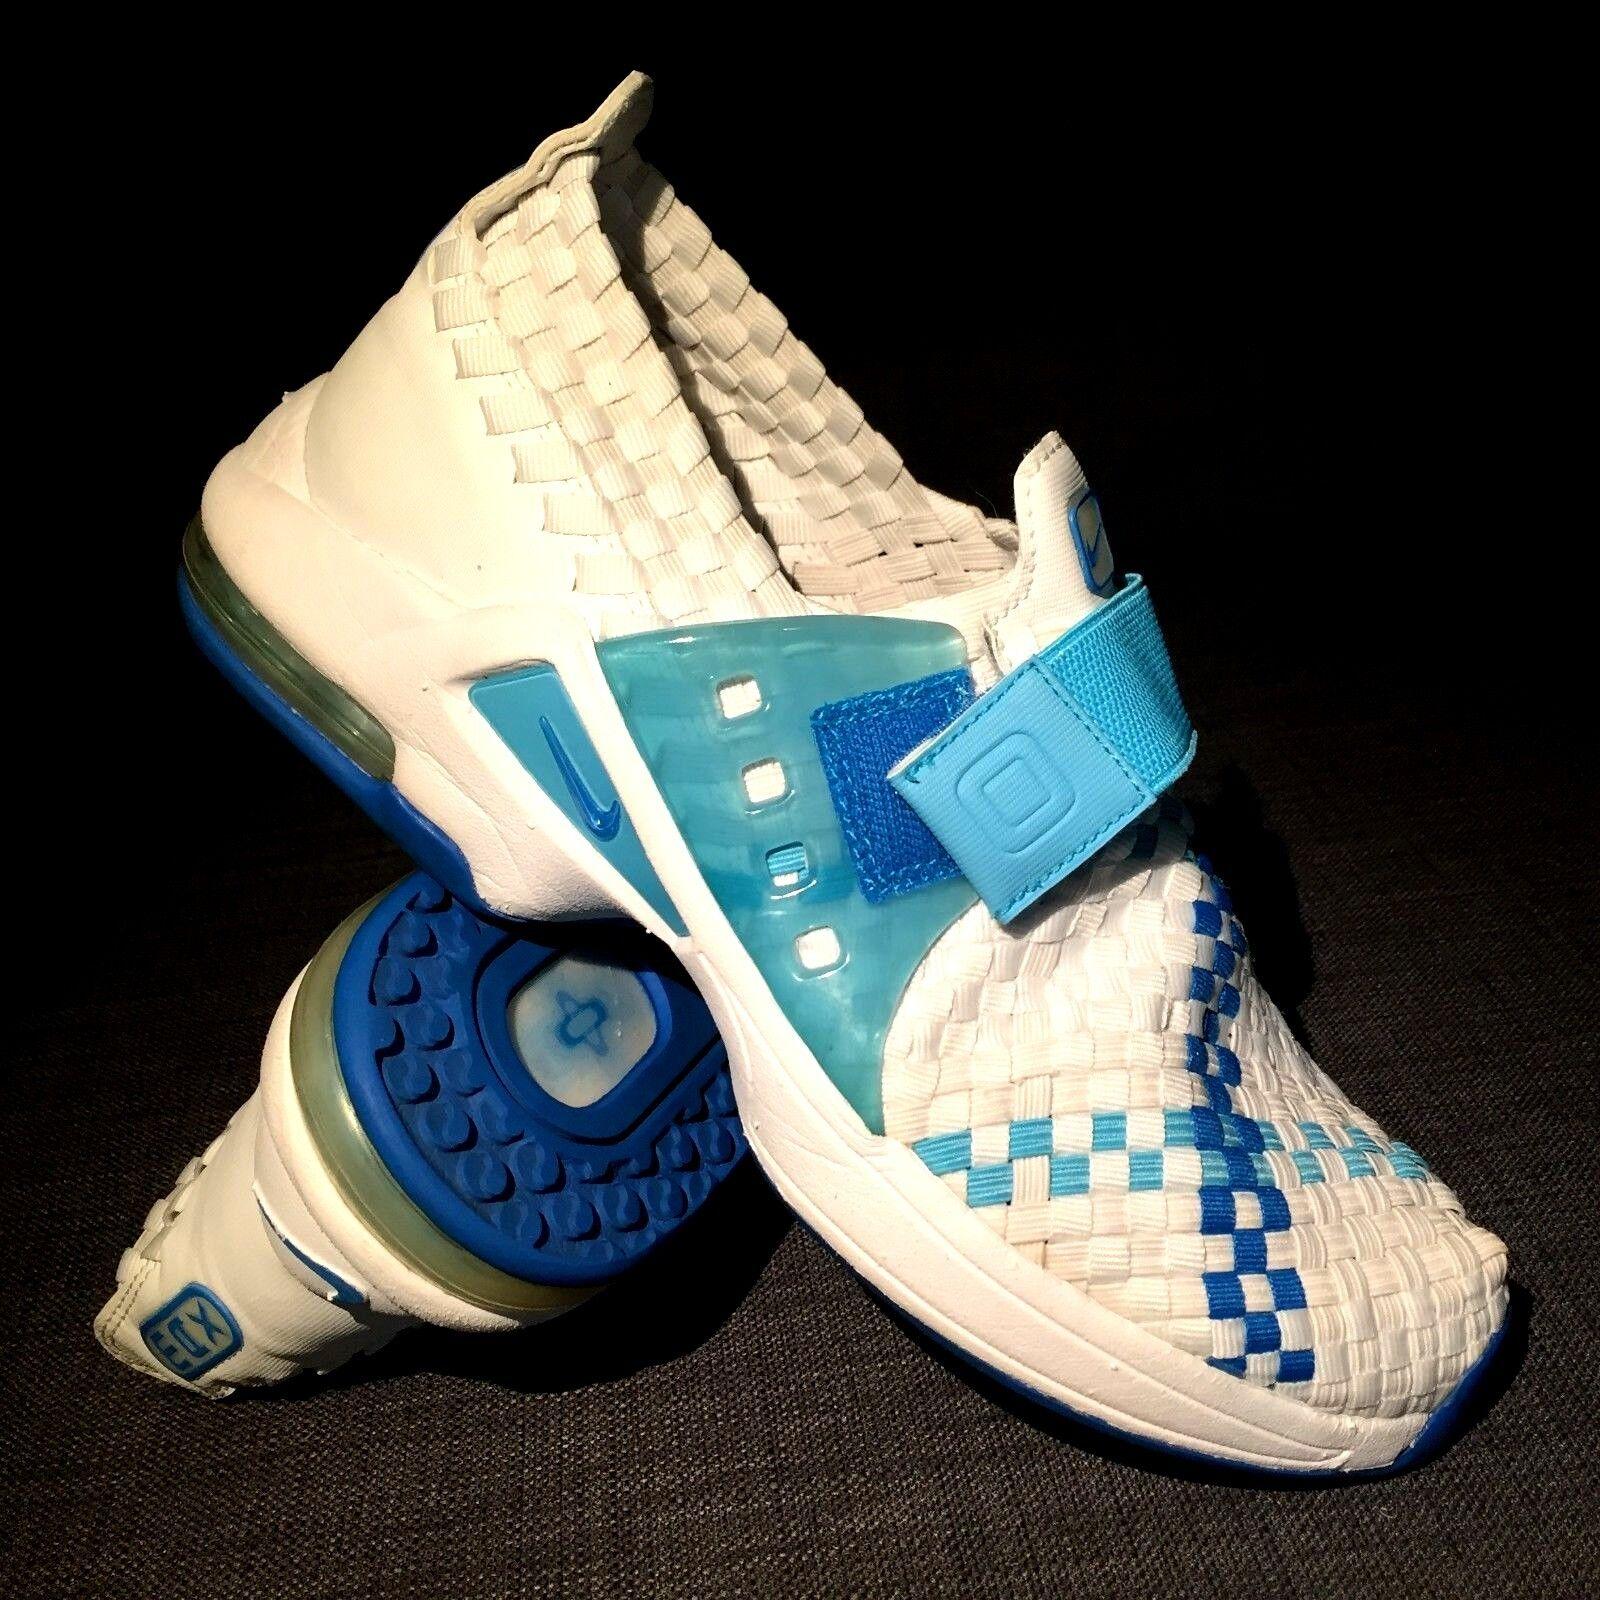 RARE VINTAGE NIKE RETRO AIR MAX BOX WEAVE Blanc Bleu trainers Sz 8.5 US 40 EUR